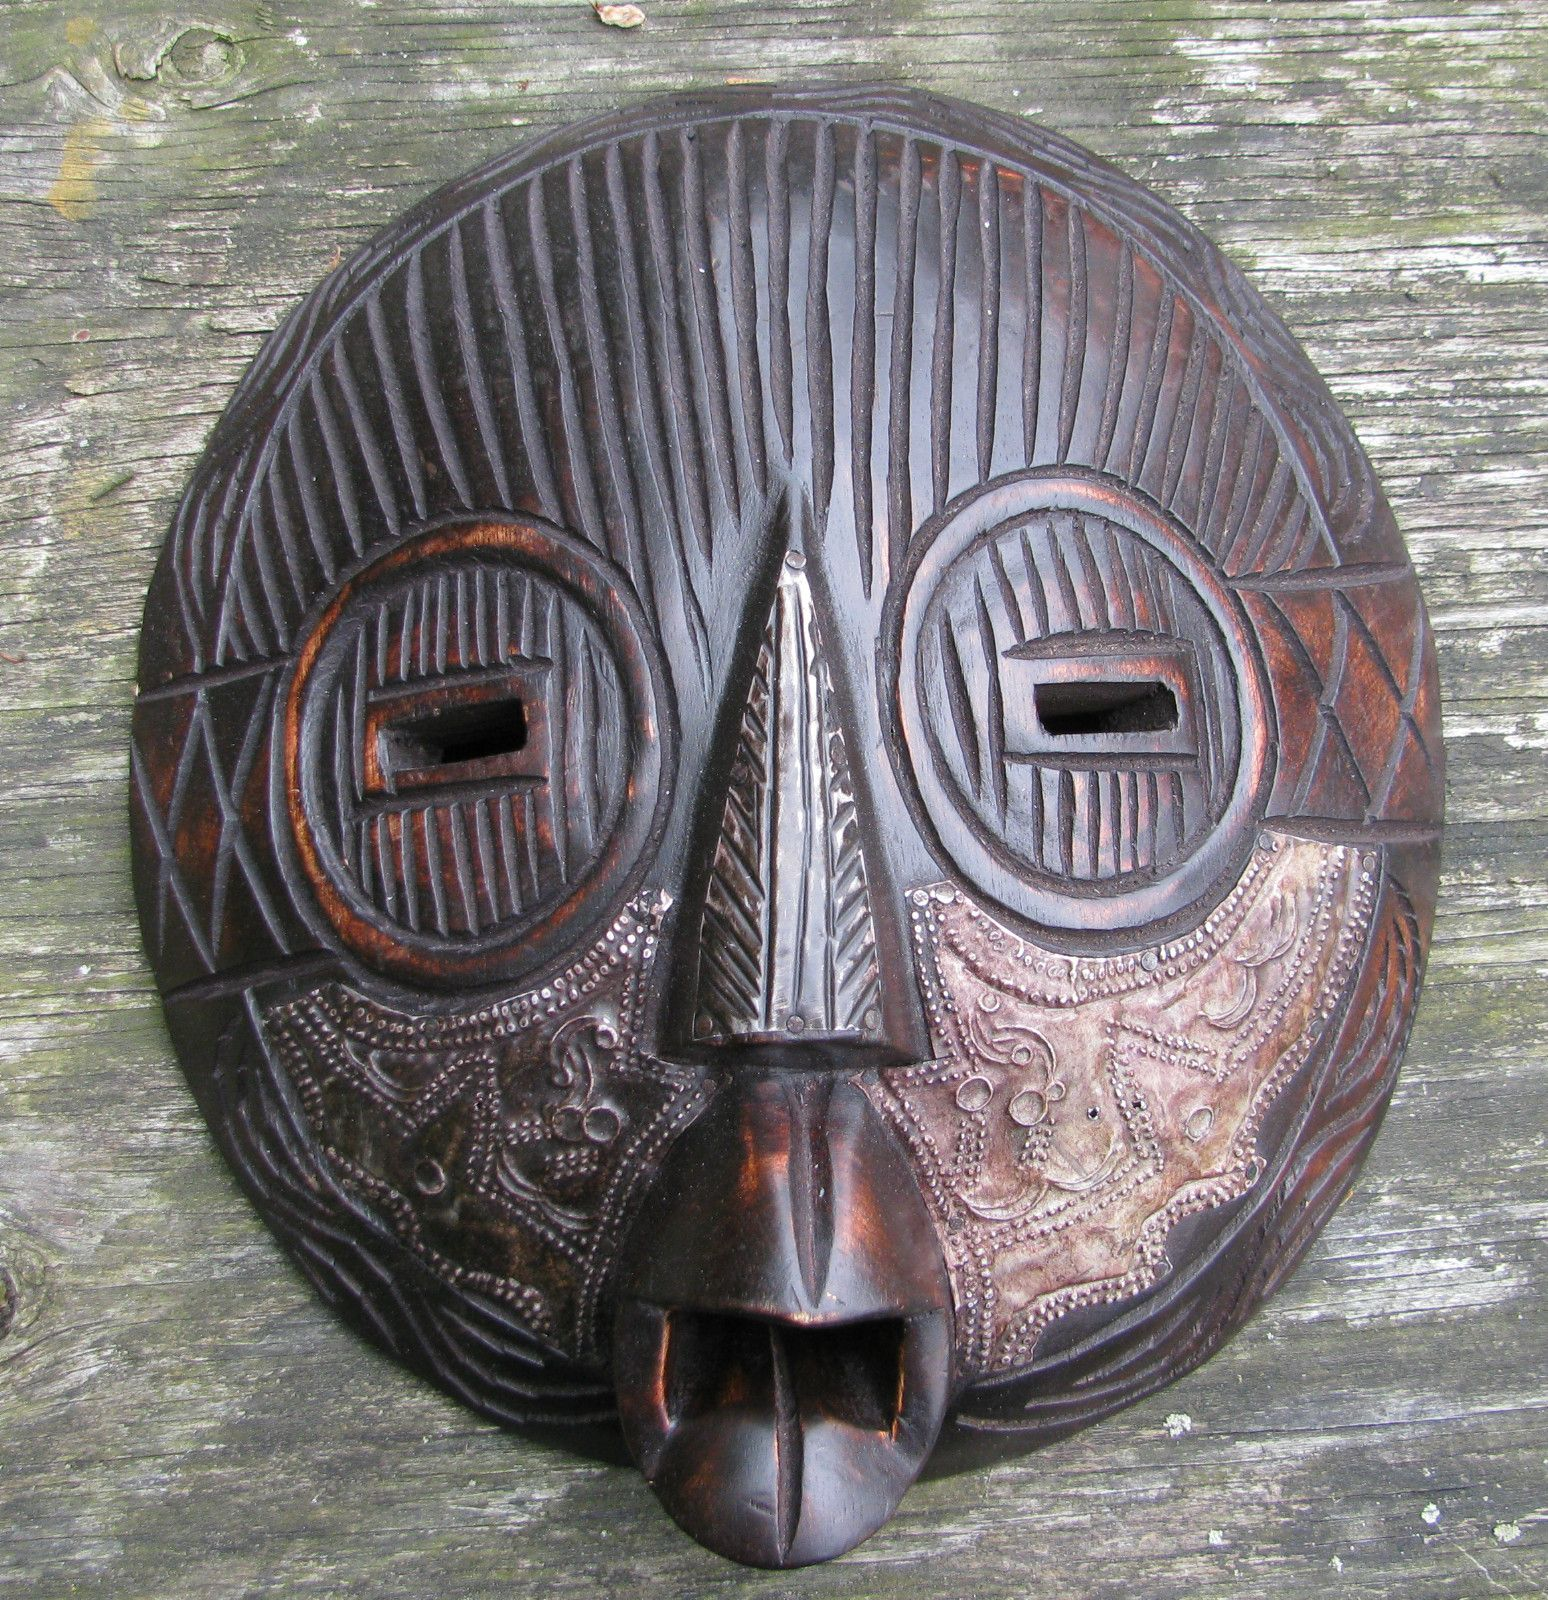 Ancient african terracotta bust | African art, African ...  |African Artifacts From Ghana